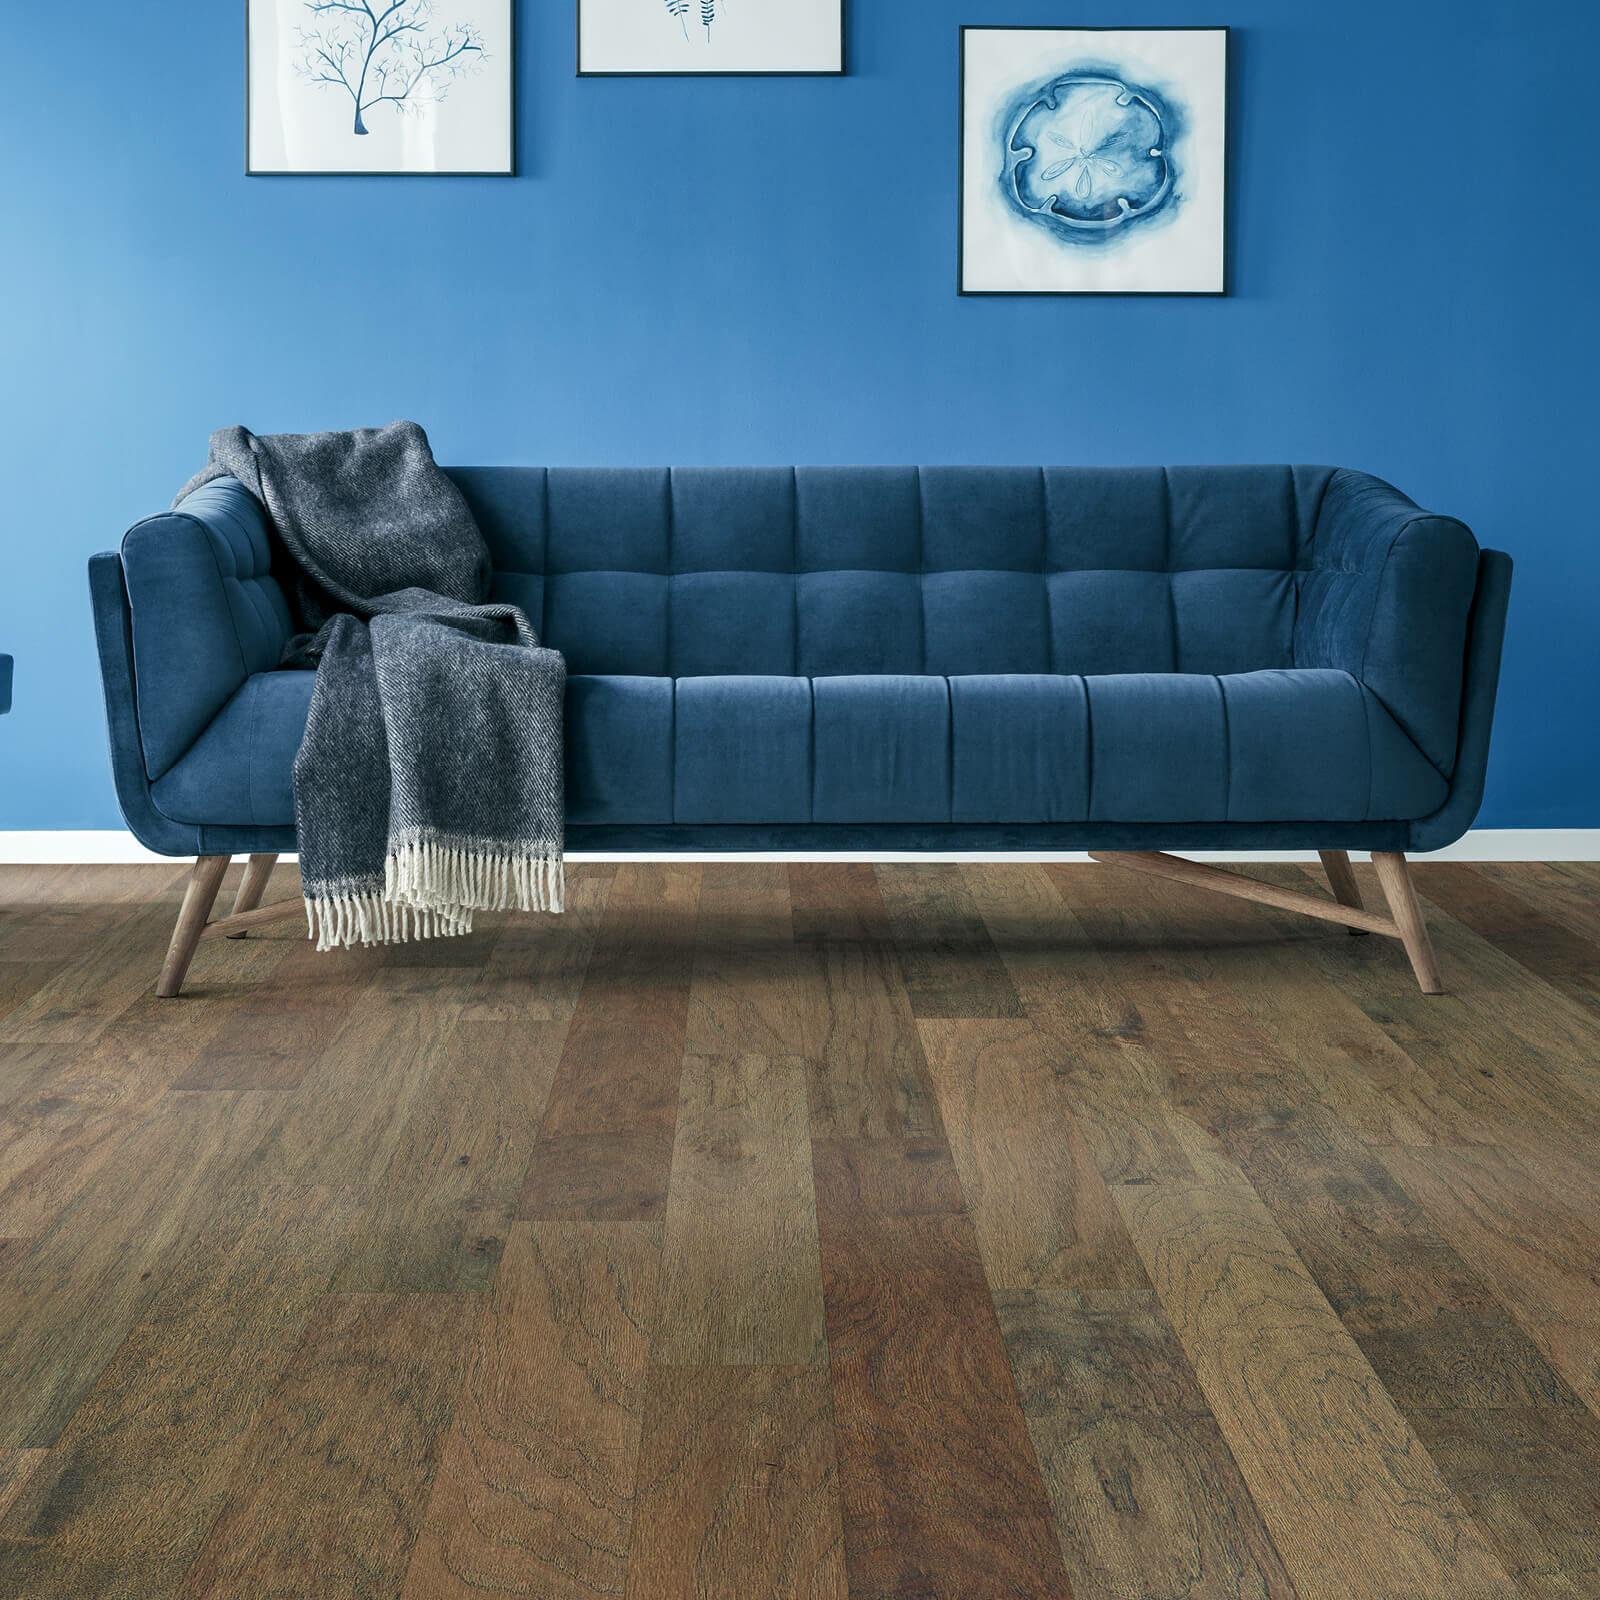 Pantone color | Great Lakes Carpet & Tile